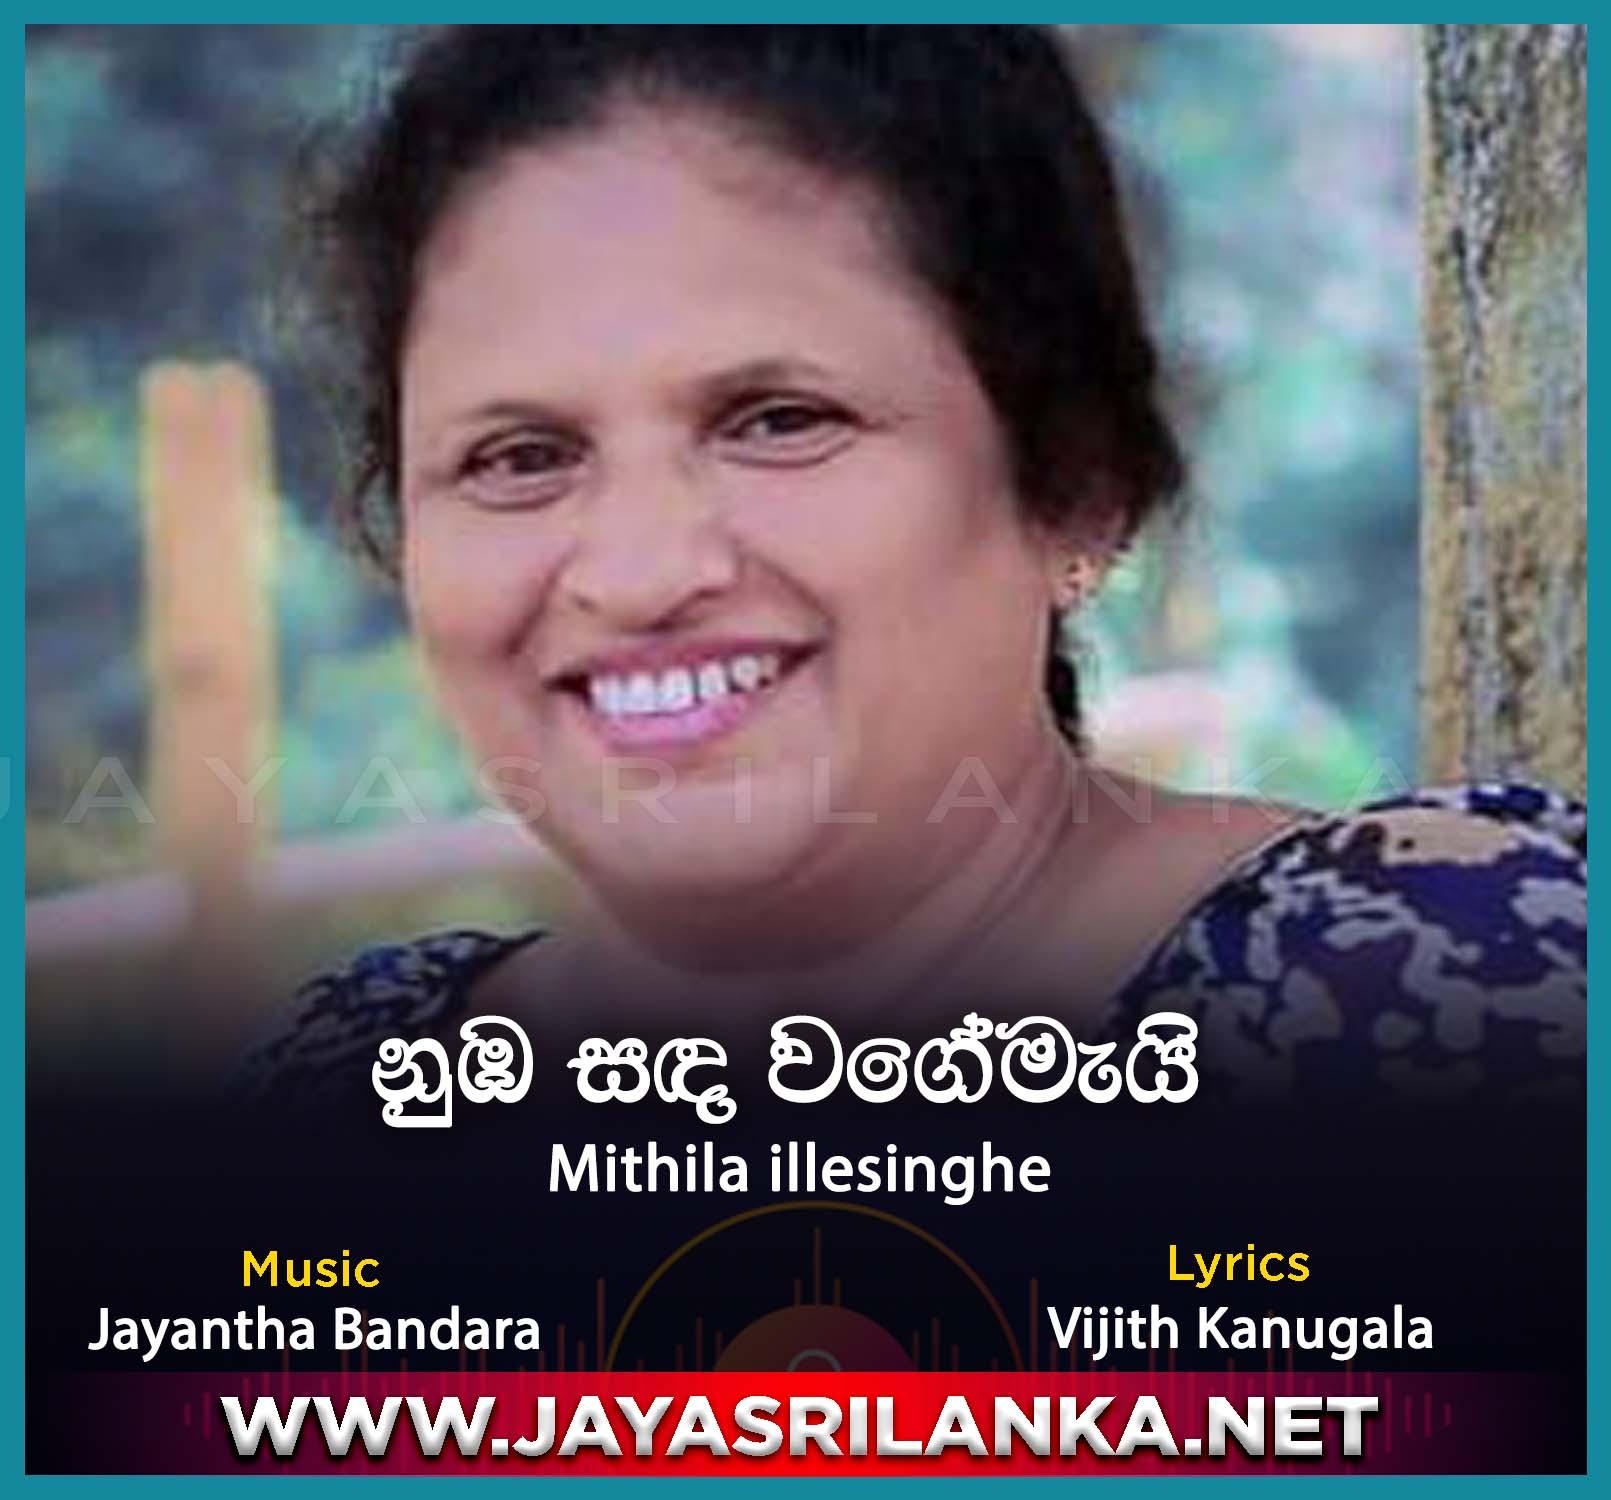 jayasrilanka ~ Numba Sanda Wagemai - Mithila Illesinghe